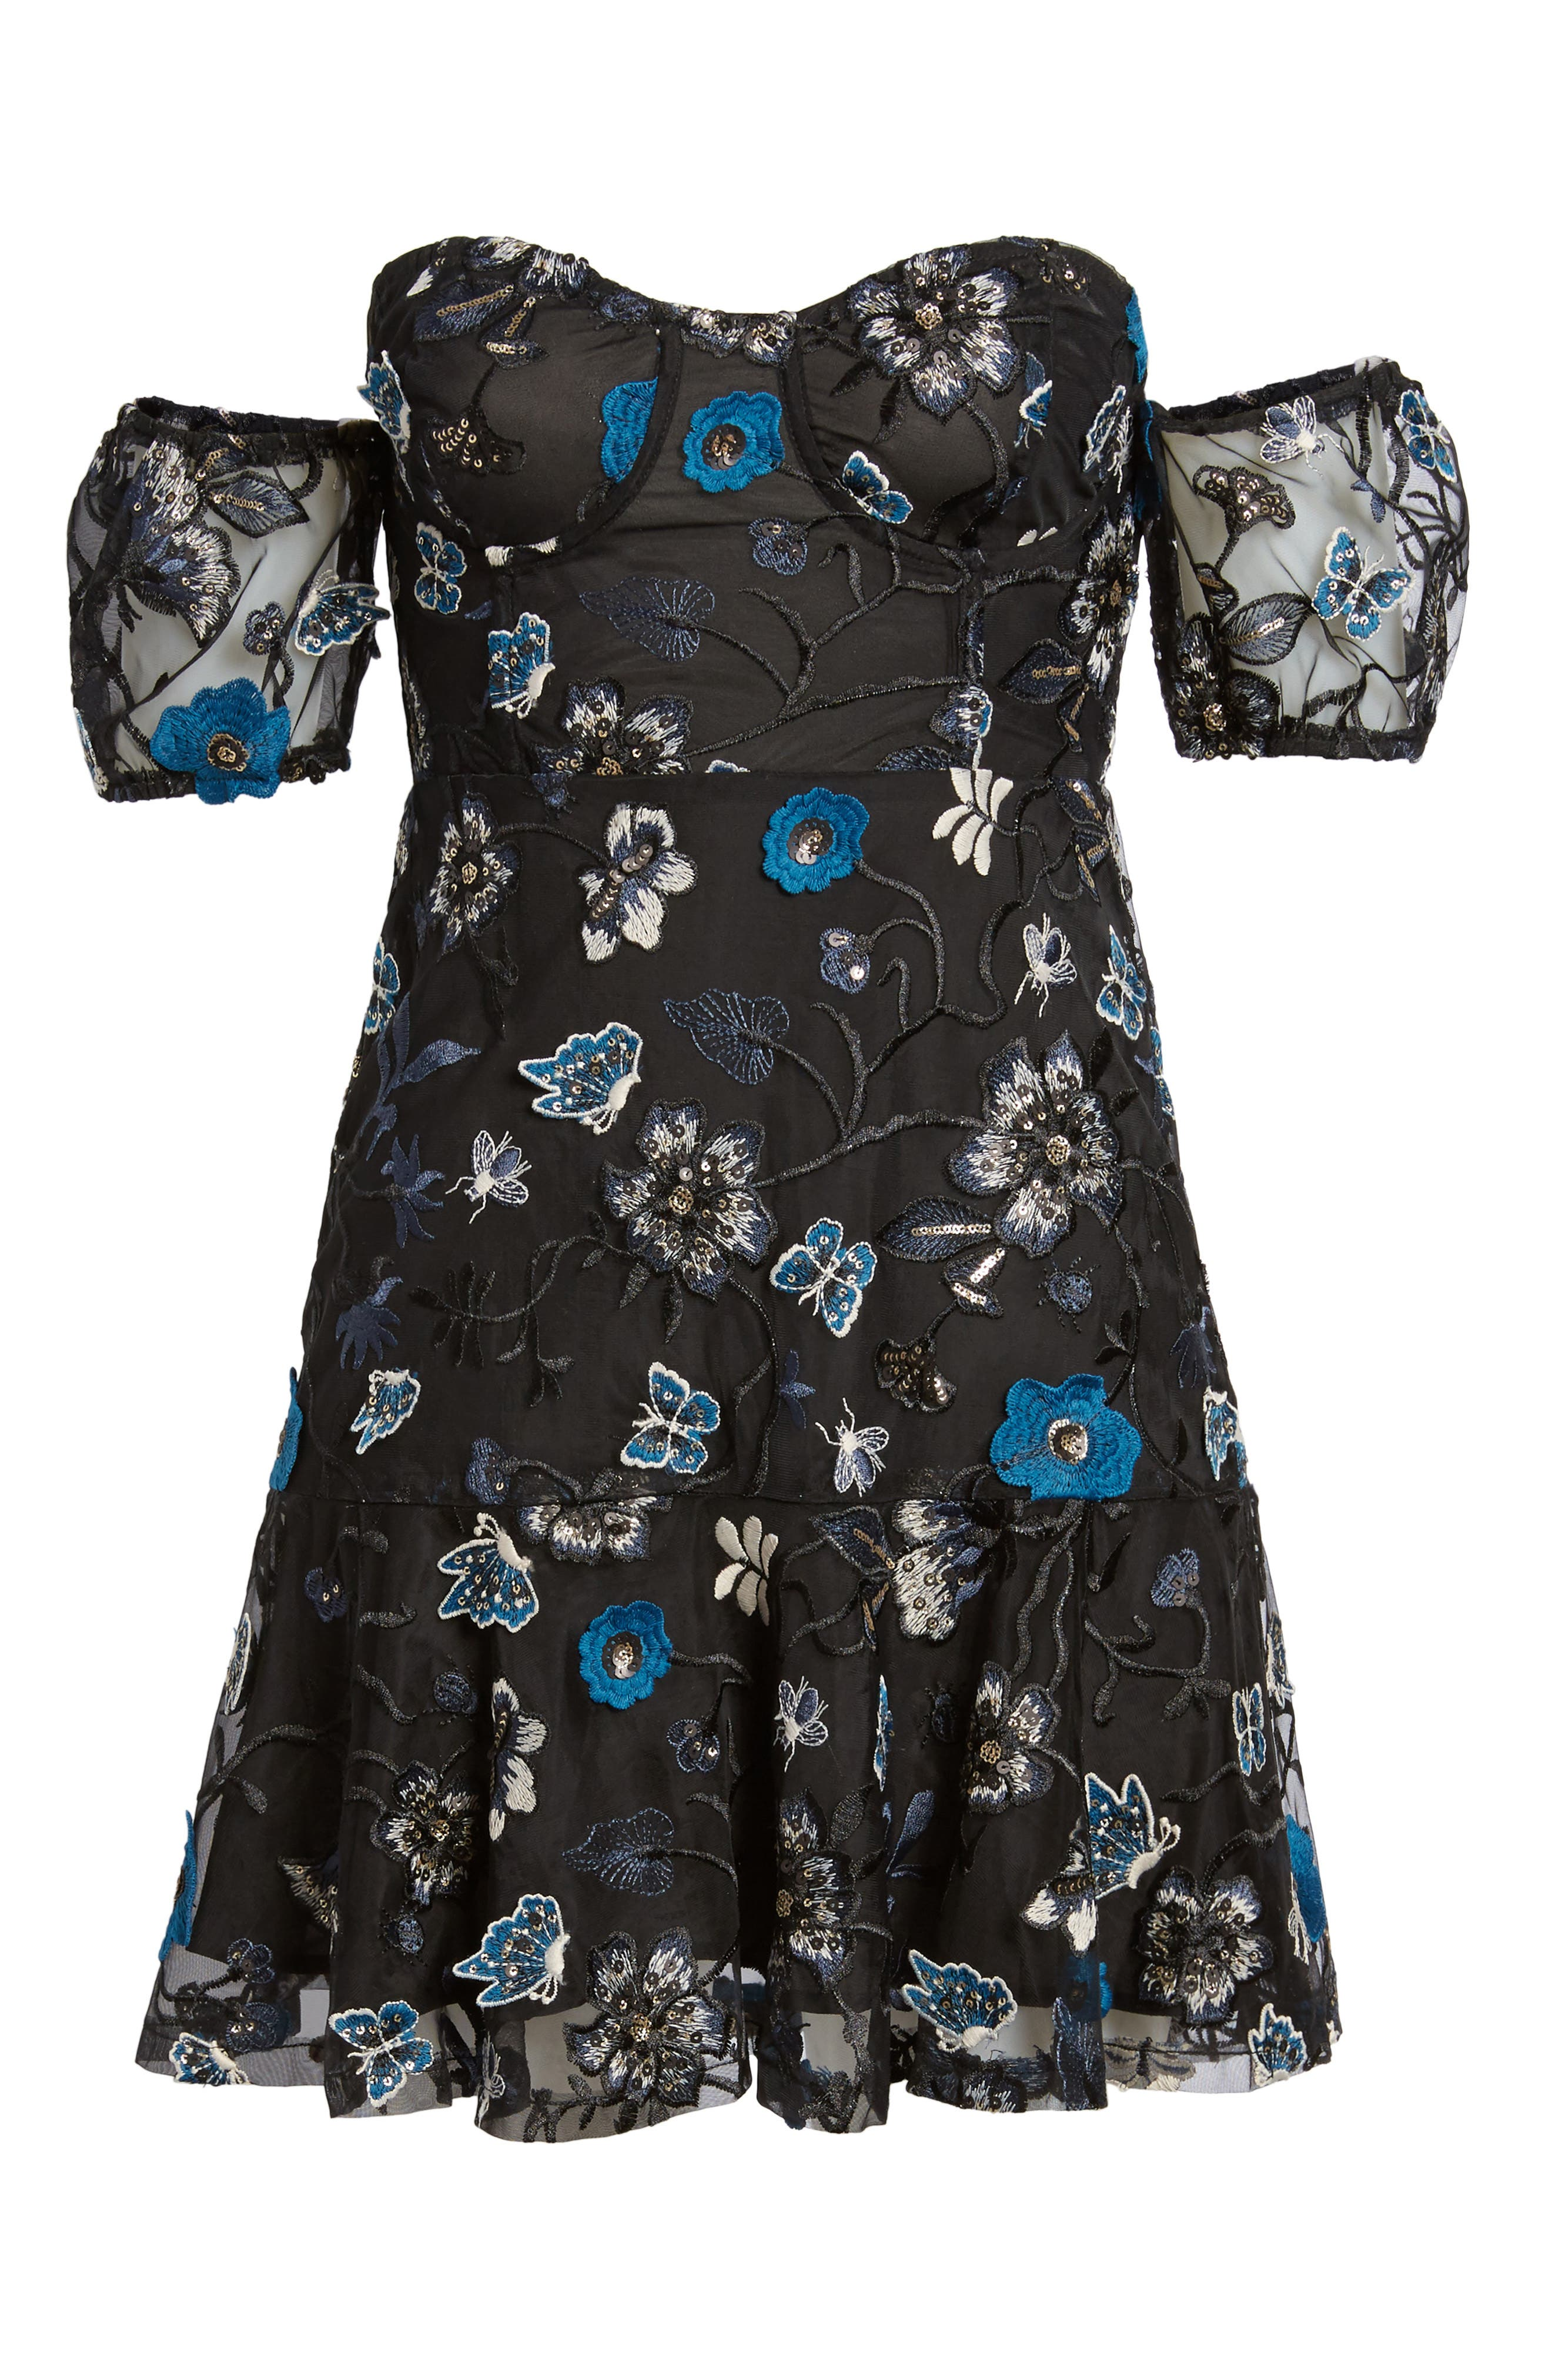 Bontanic Off the Shoulder Dress,                             Alternate thumbnail 6, color,                             002